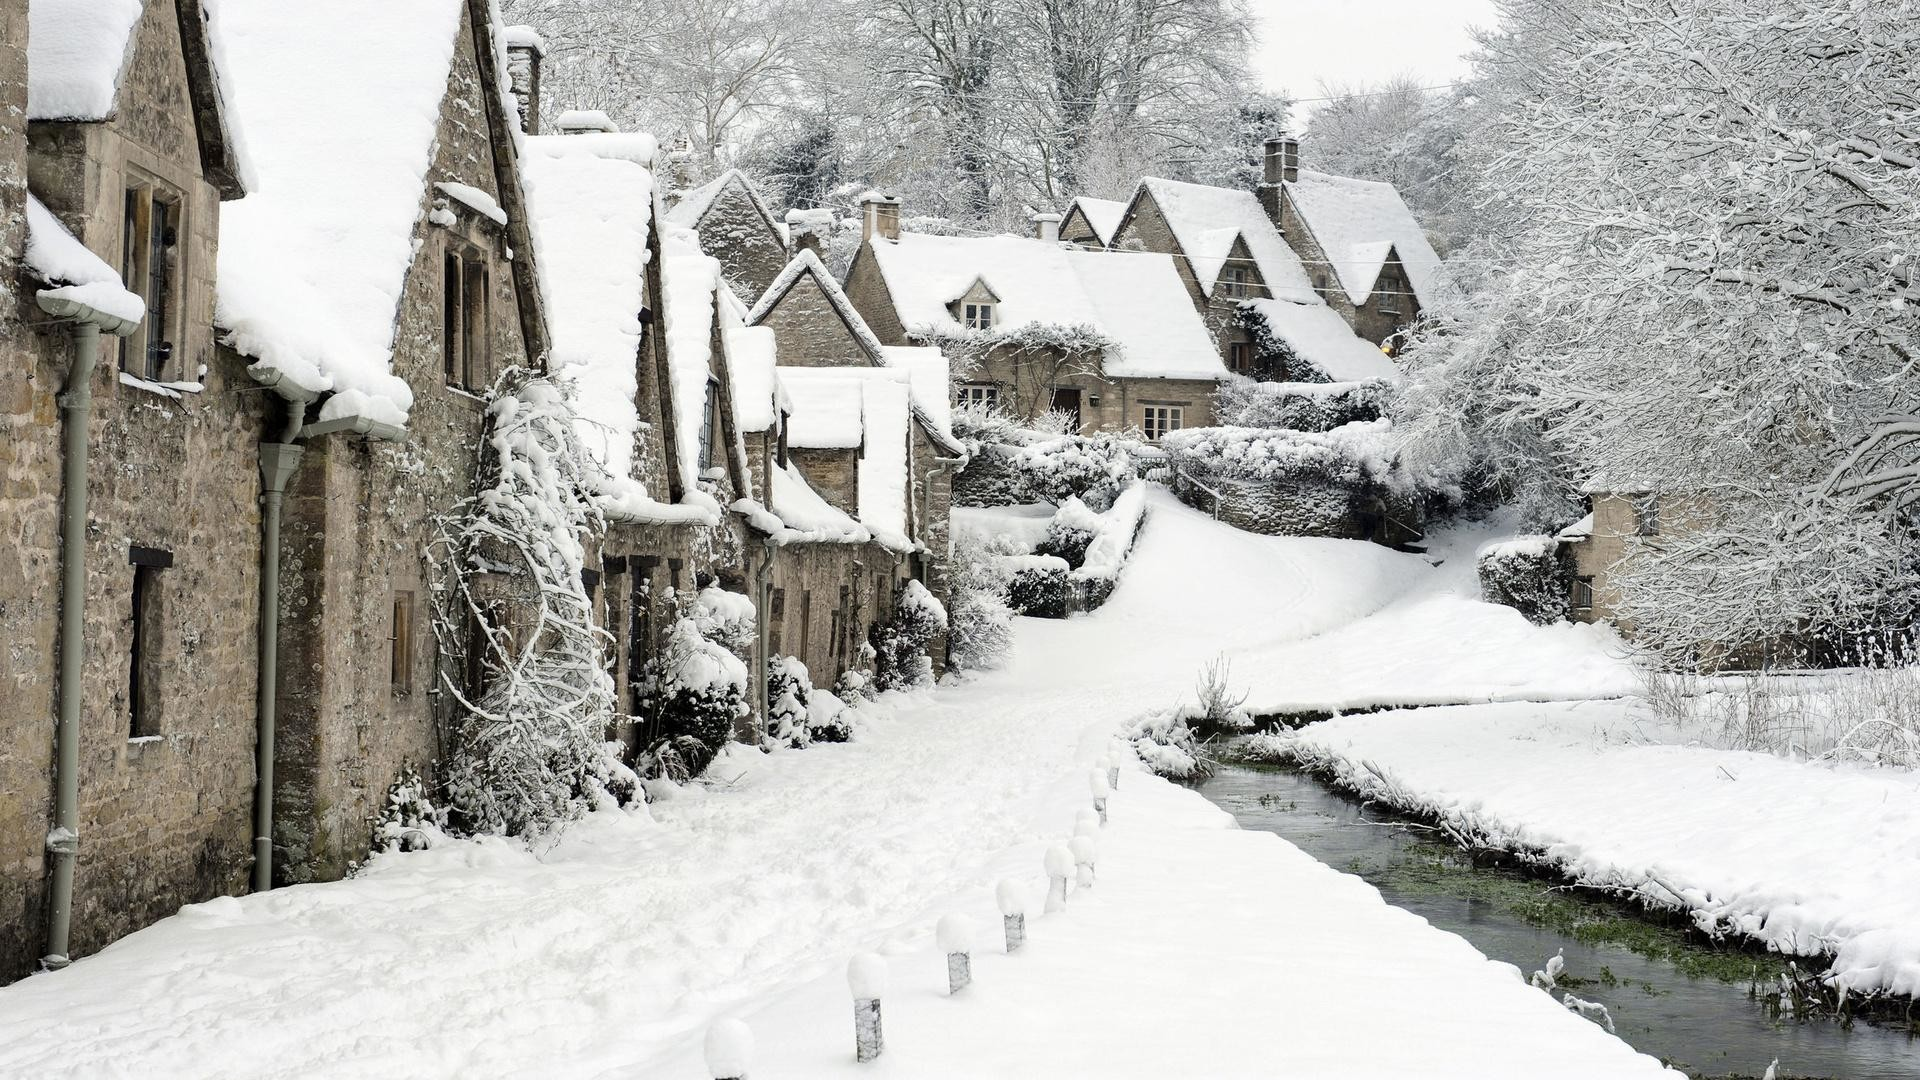 wallpaper.wiki-Winter-and-Snow-Full-HD-Wallpaper-